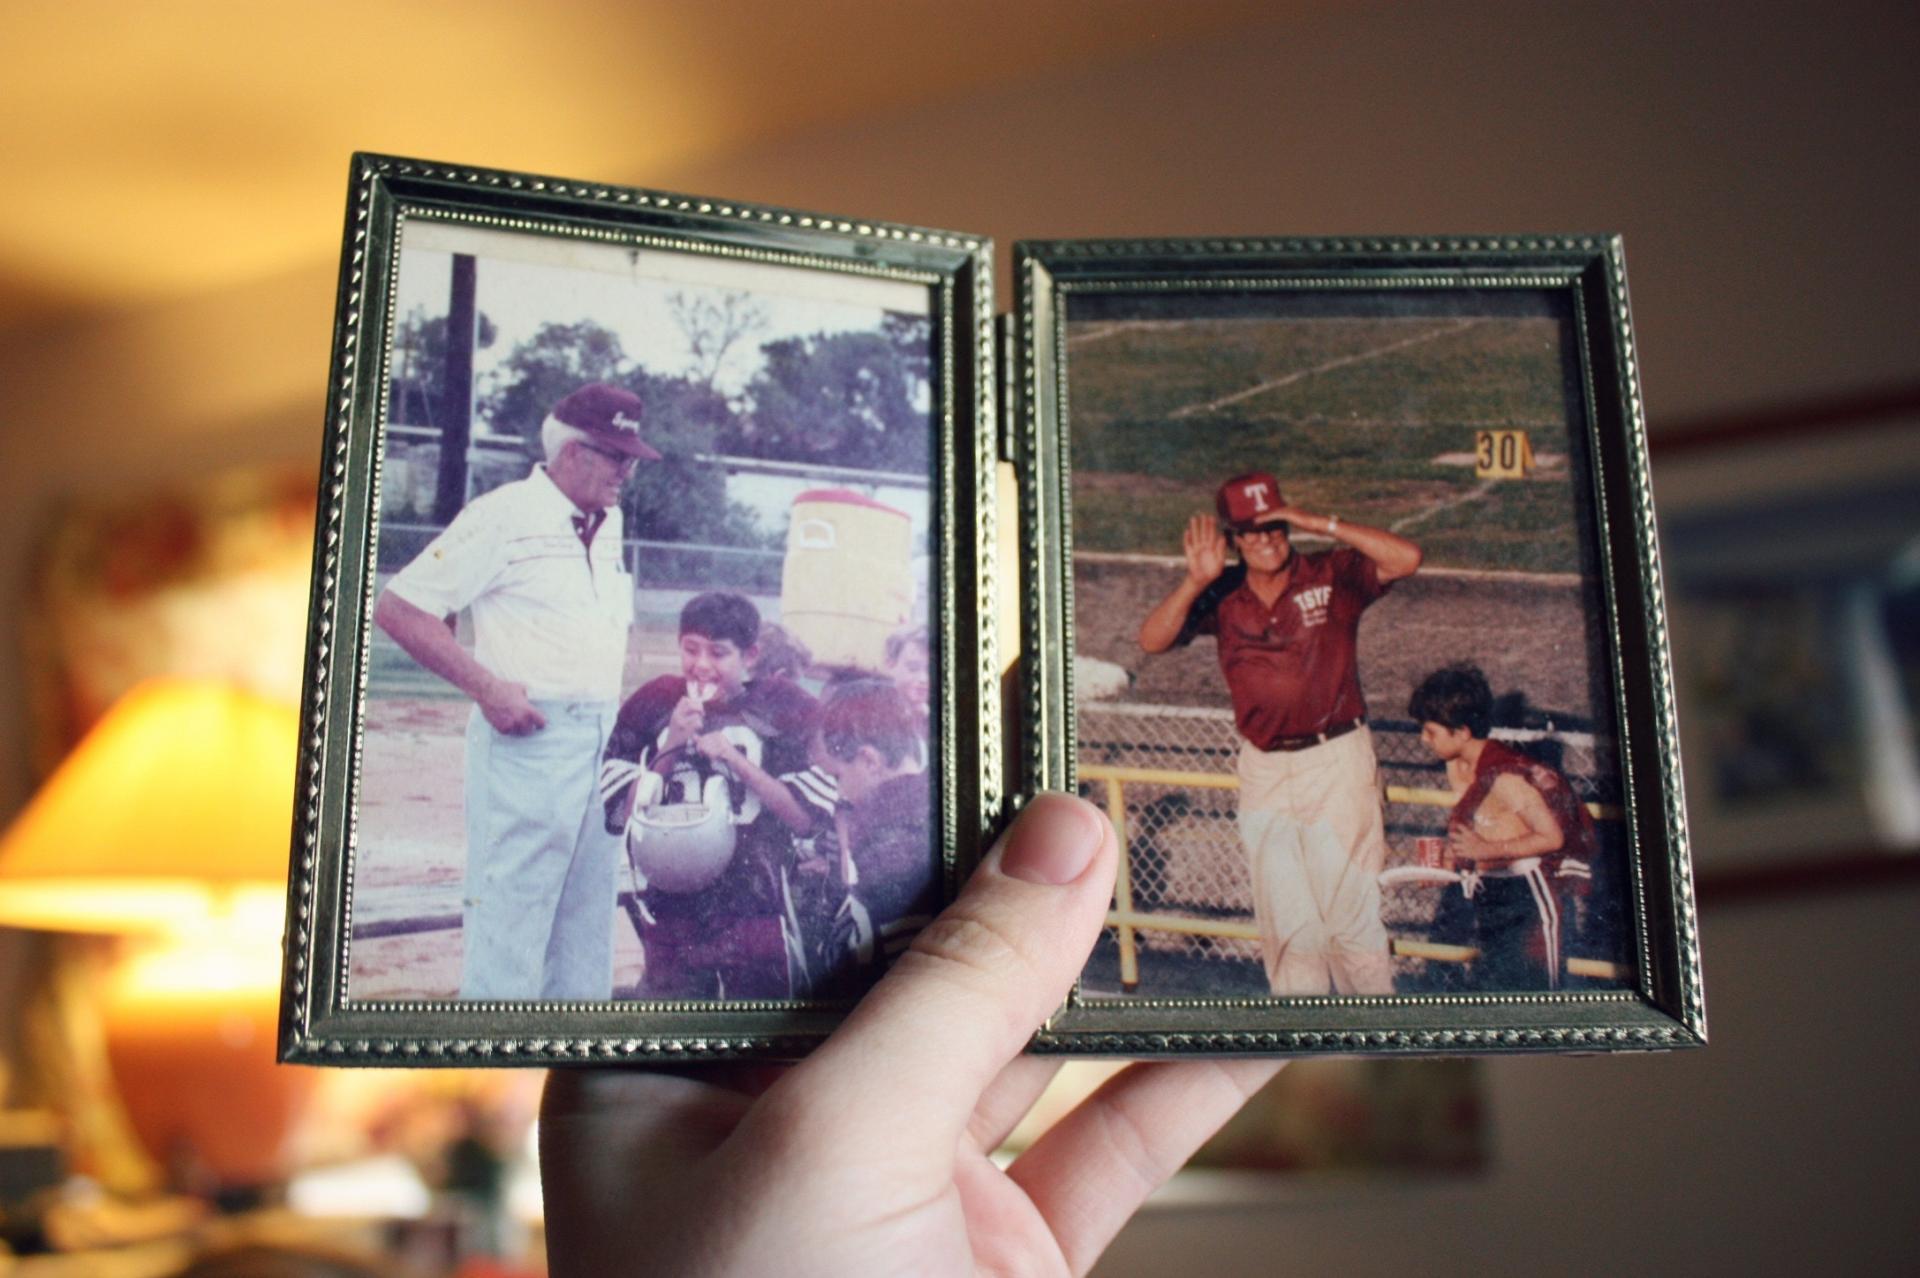 Memories - plan a family reunion